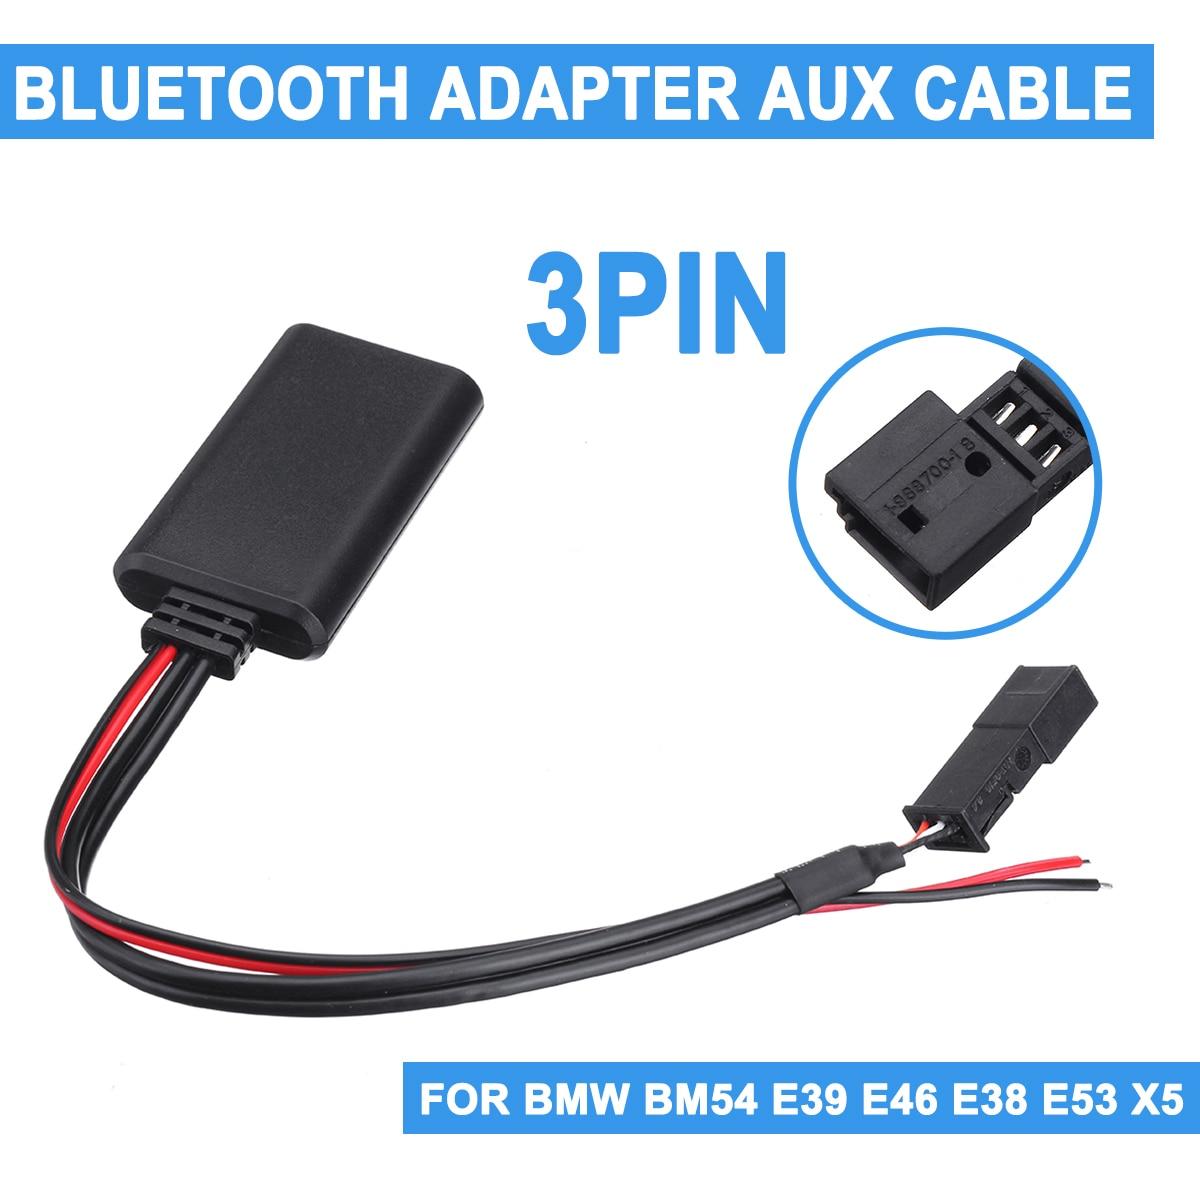 For BMW BM54 E39 E46 E38 E53 X5 Car bluetooth Module AUX IN Audio Radio Adapter 3 pin Car Electronics Accessories|Bluetooth Car Kit| |  - title=